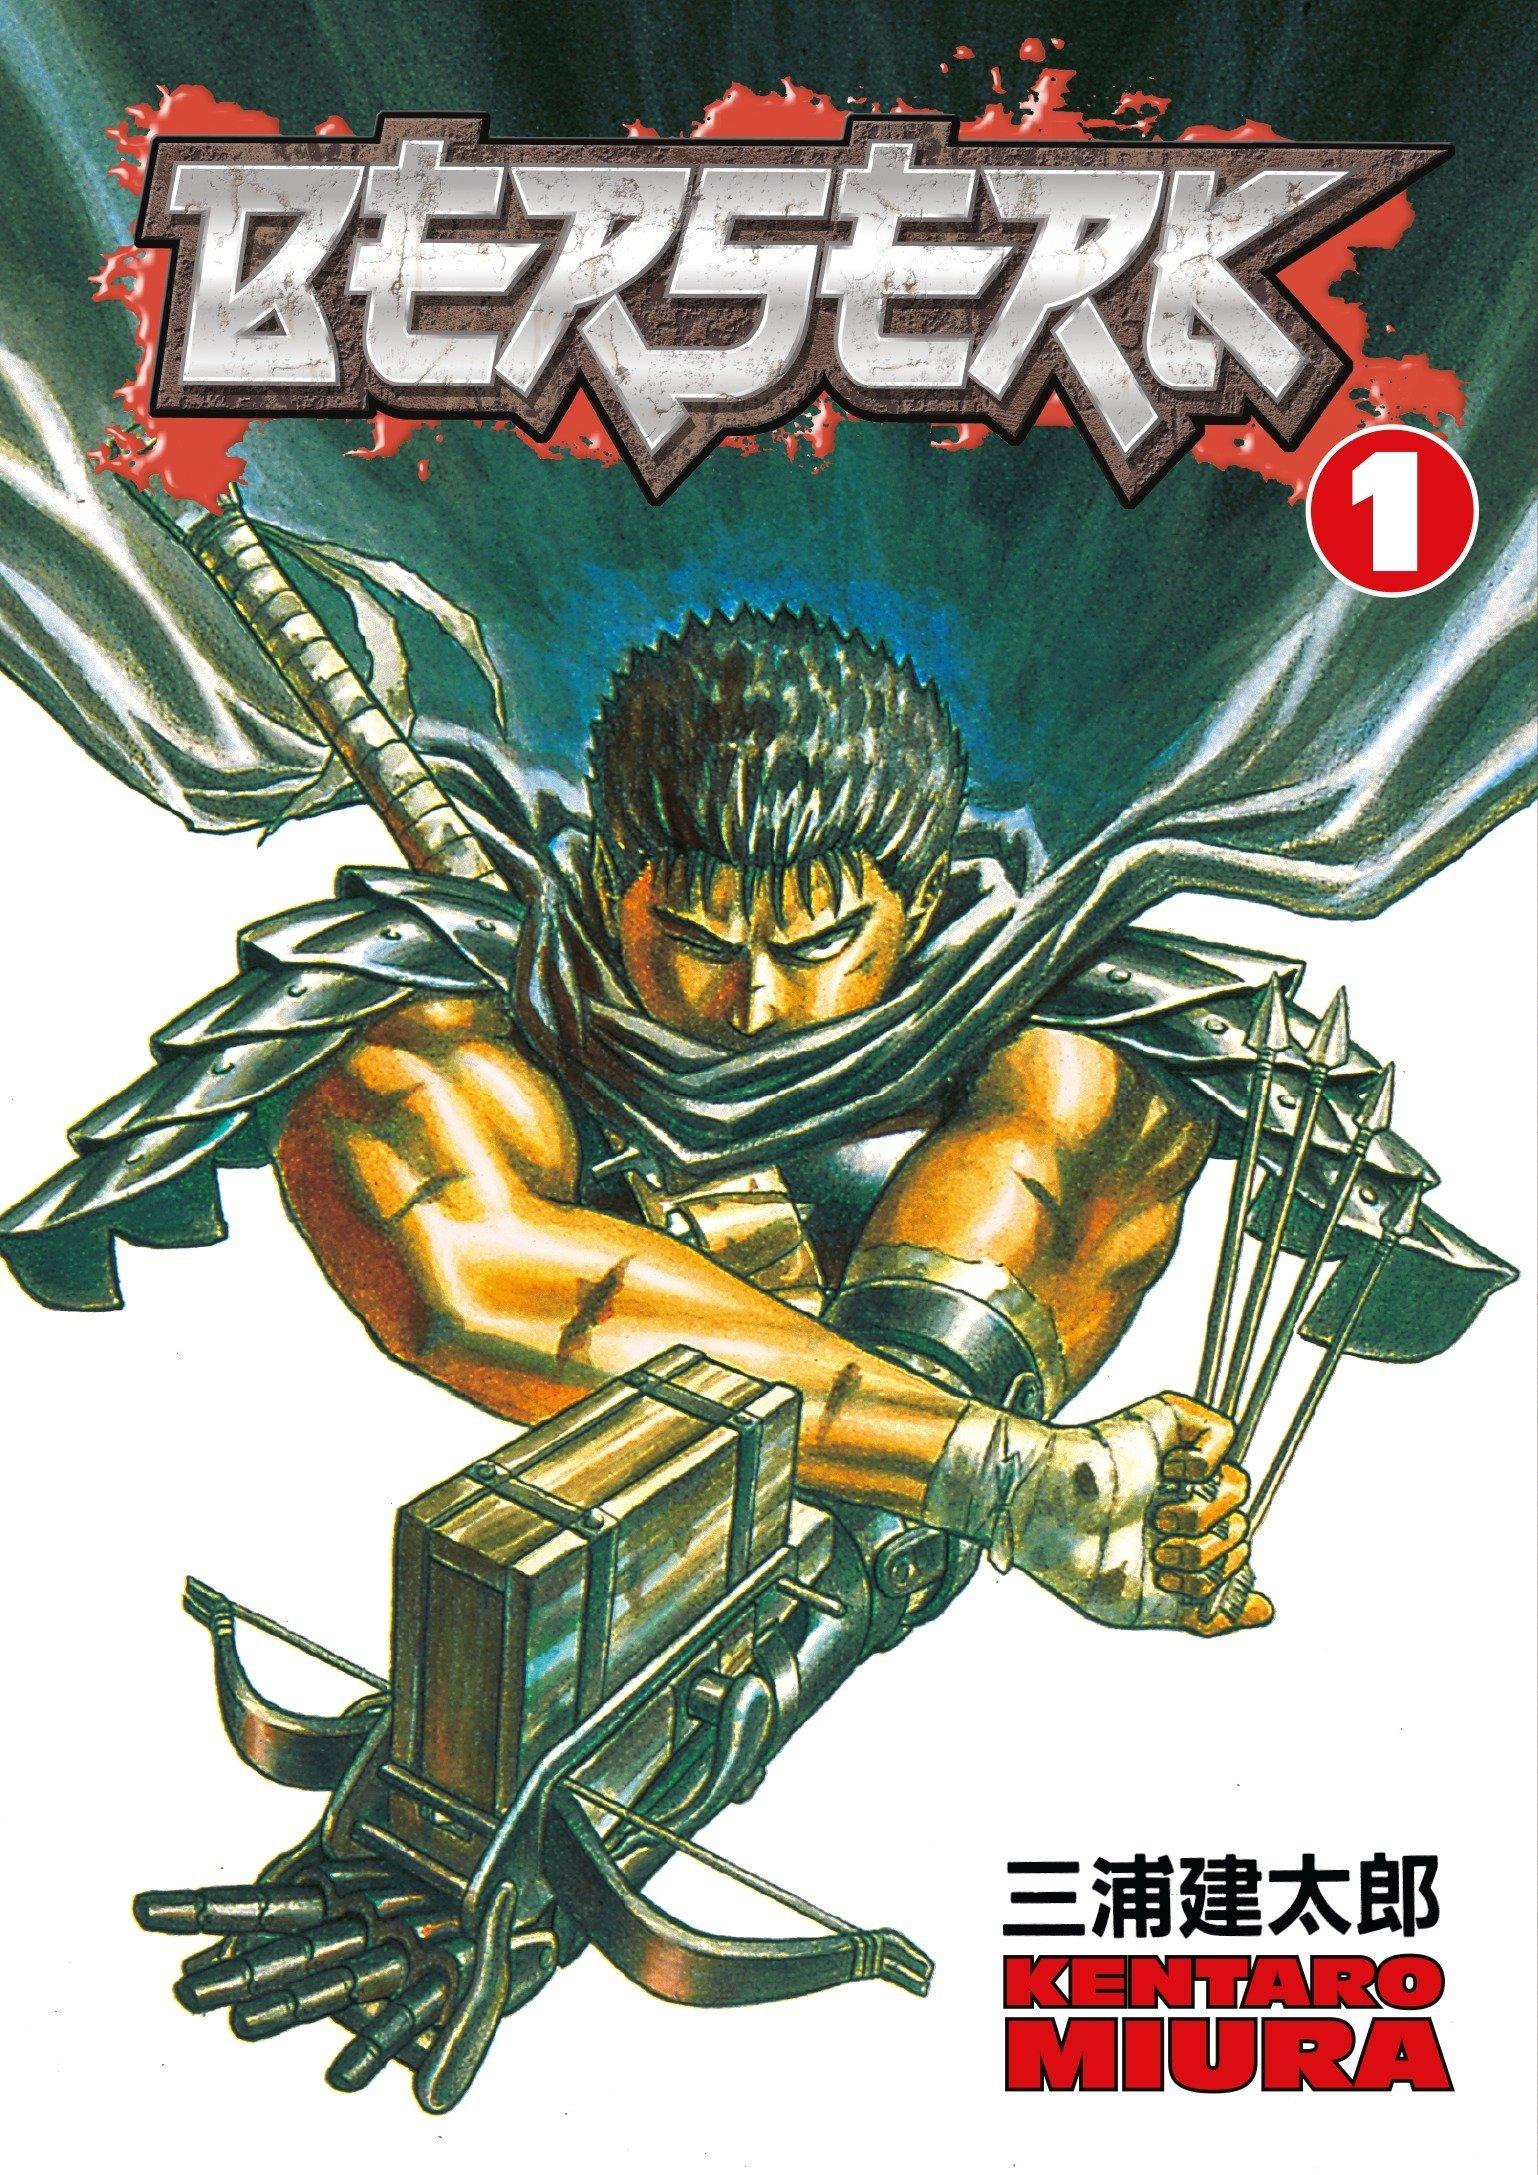 berserk vol 1 kentaro miura 8601200650624 amazon com books